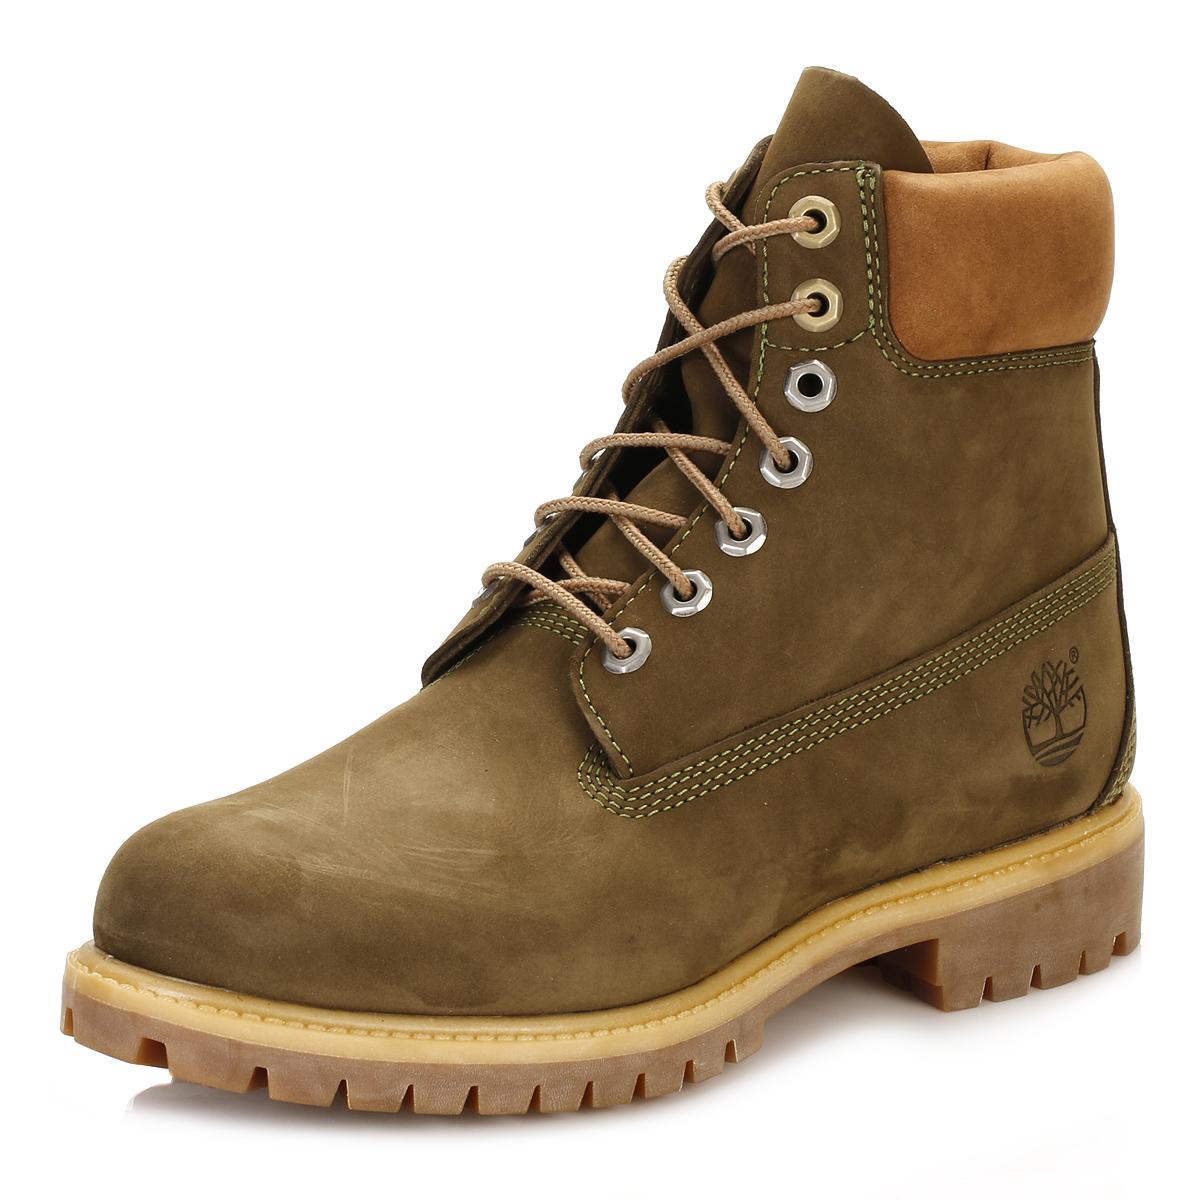 Brilliant Timberland Womenu2019s Chocorua Trail Mid GTXu00c2 Boots In Brown W/Green U2013 Uwomenshoe